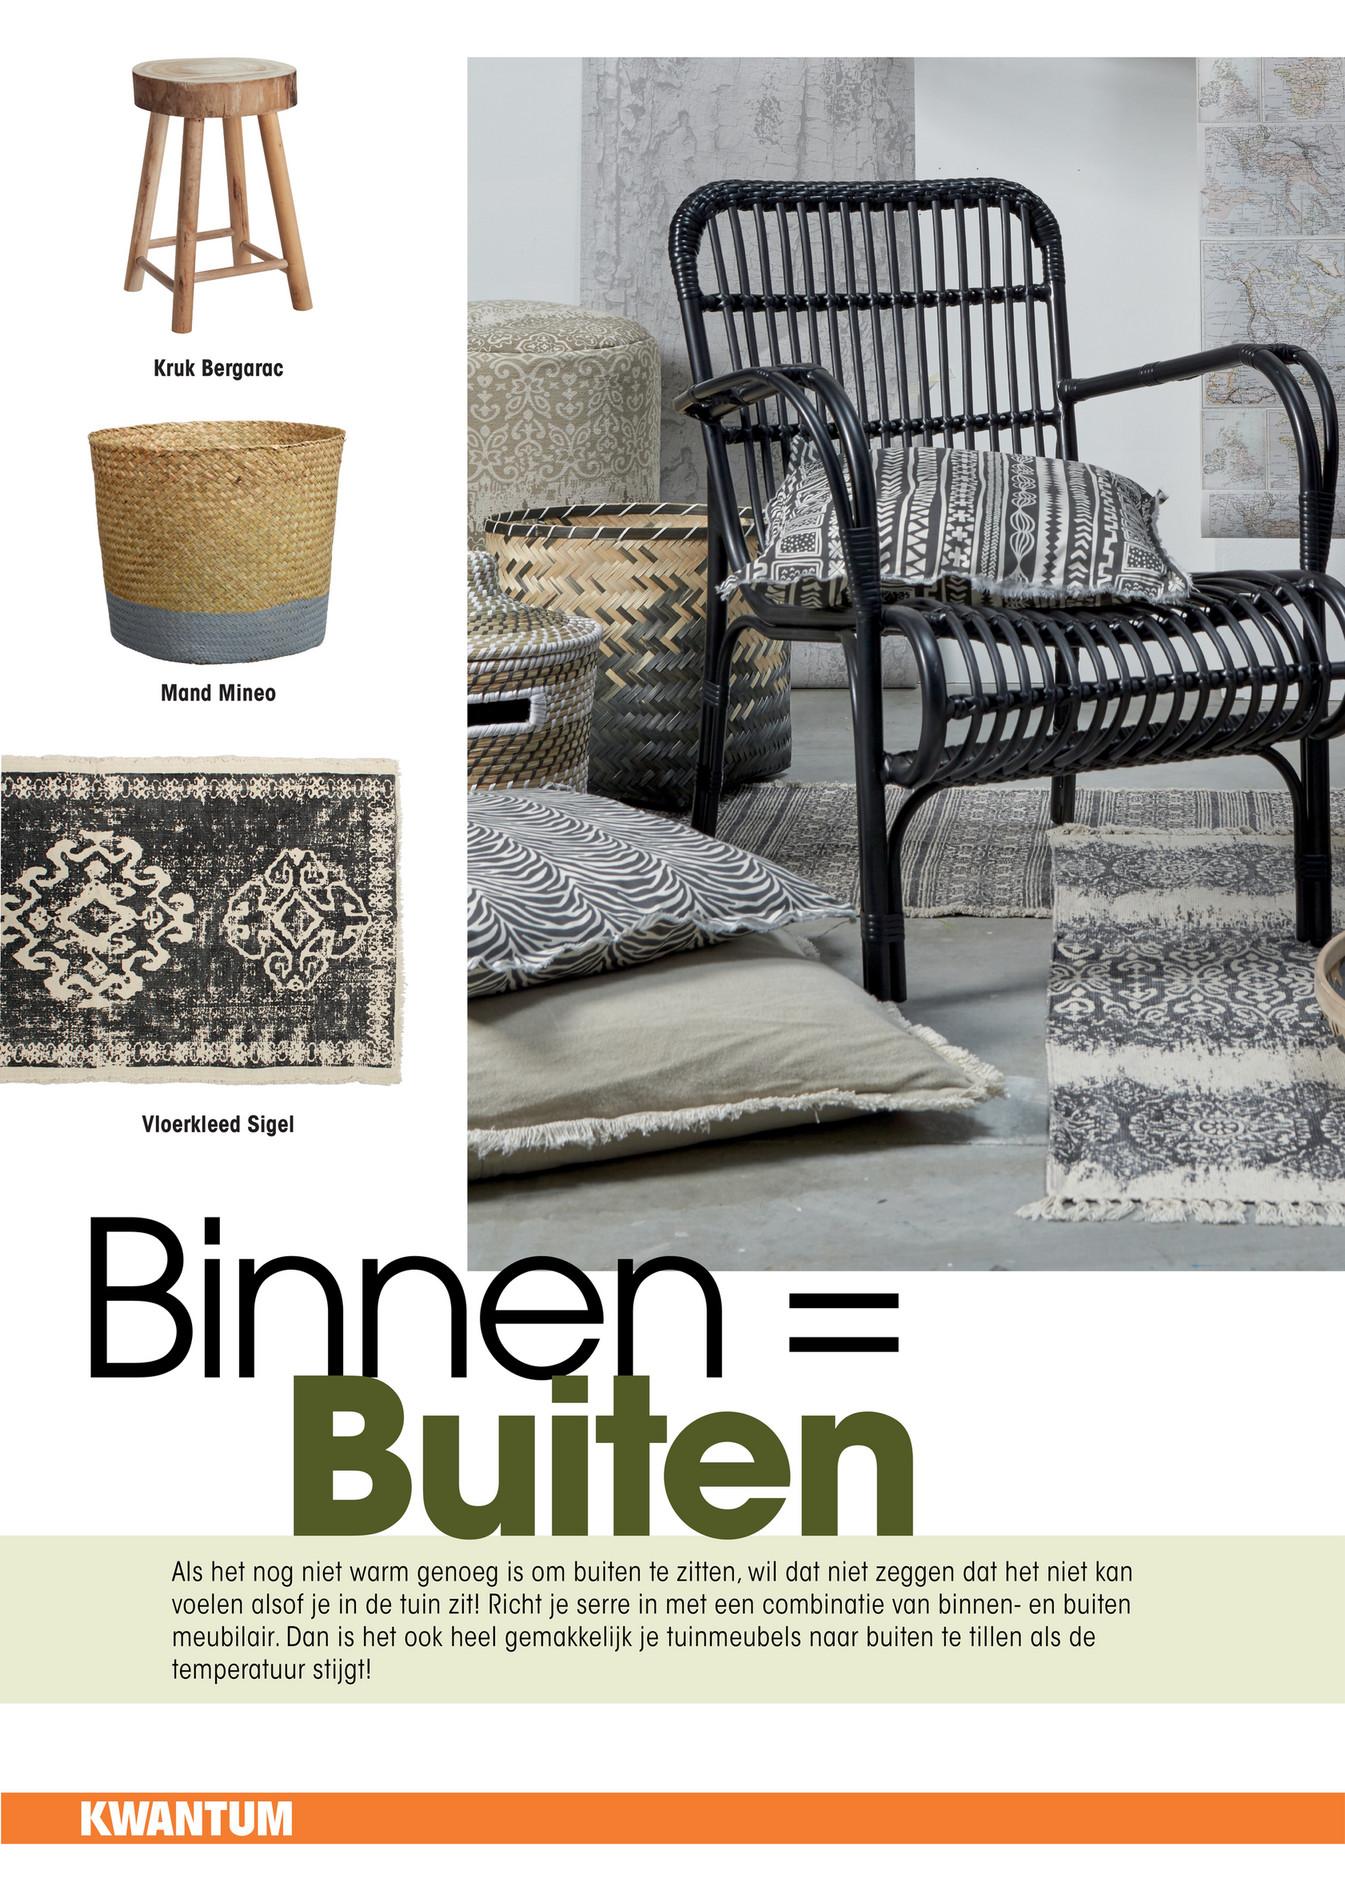 Kwantum Magazine NL   Tuinmagazine Voorjaar 2016   Pagina 2 3